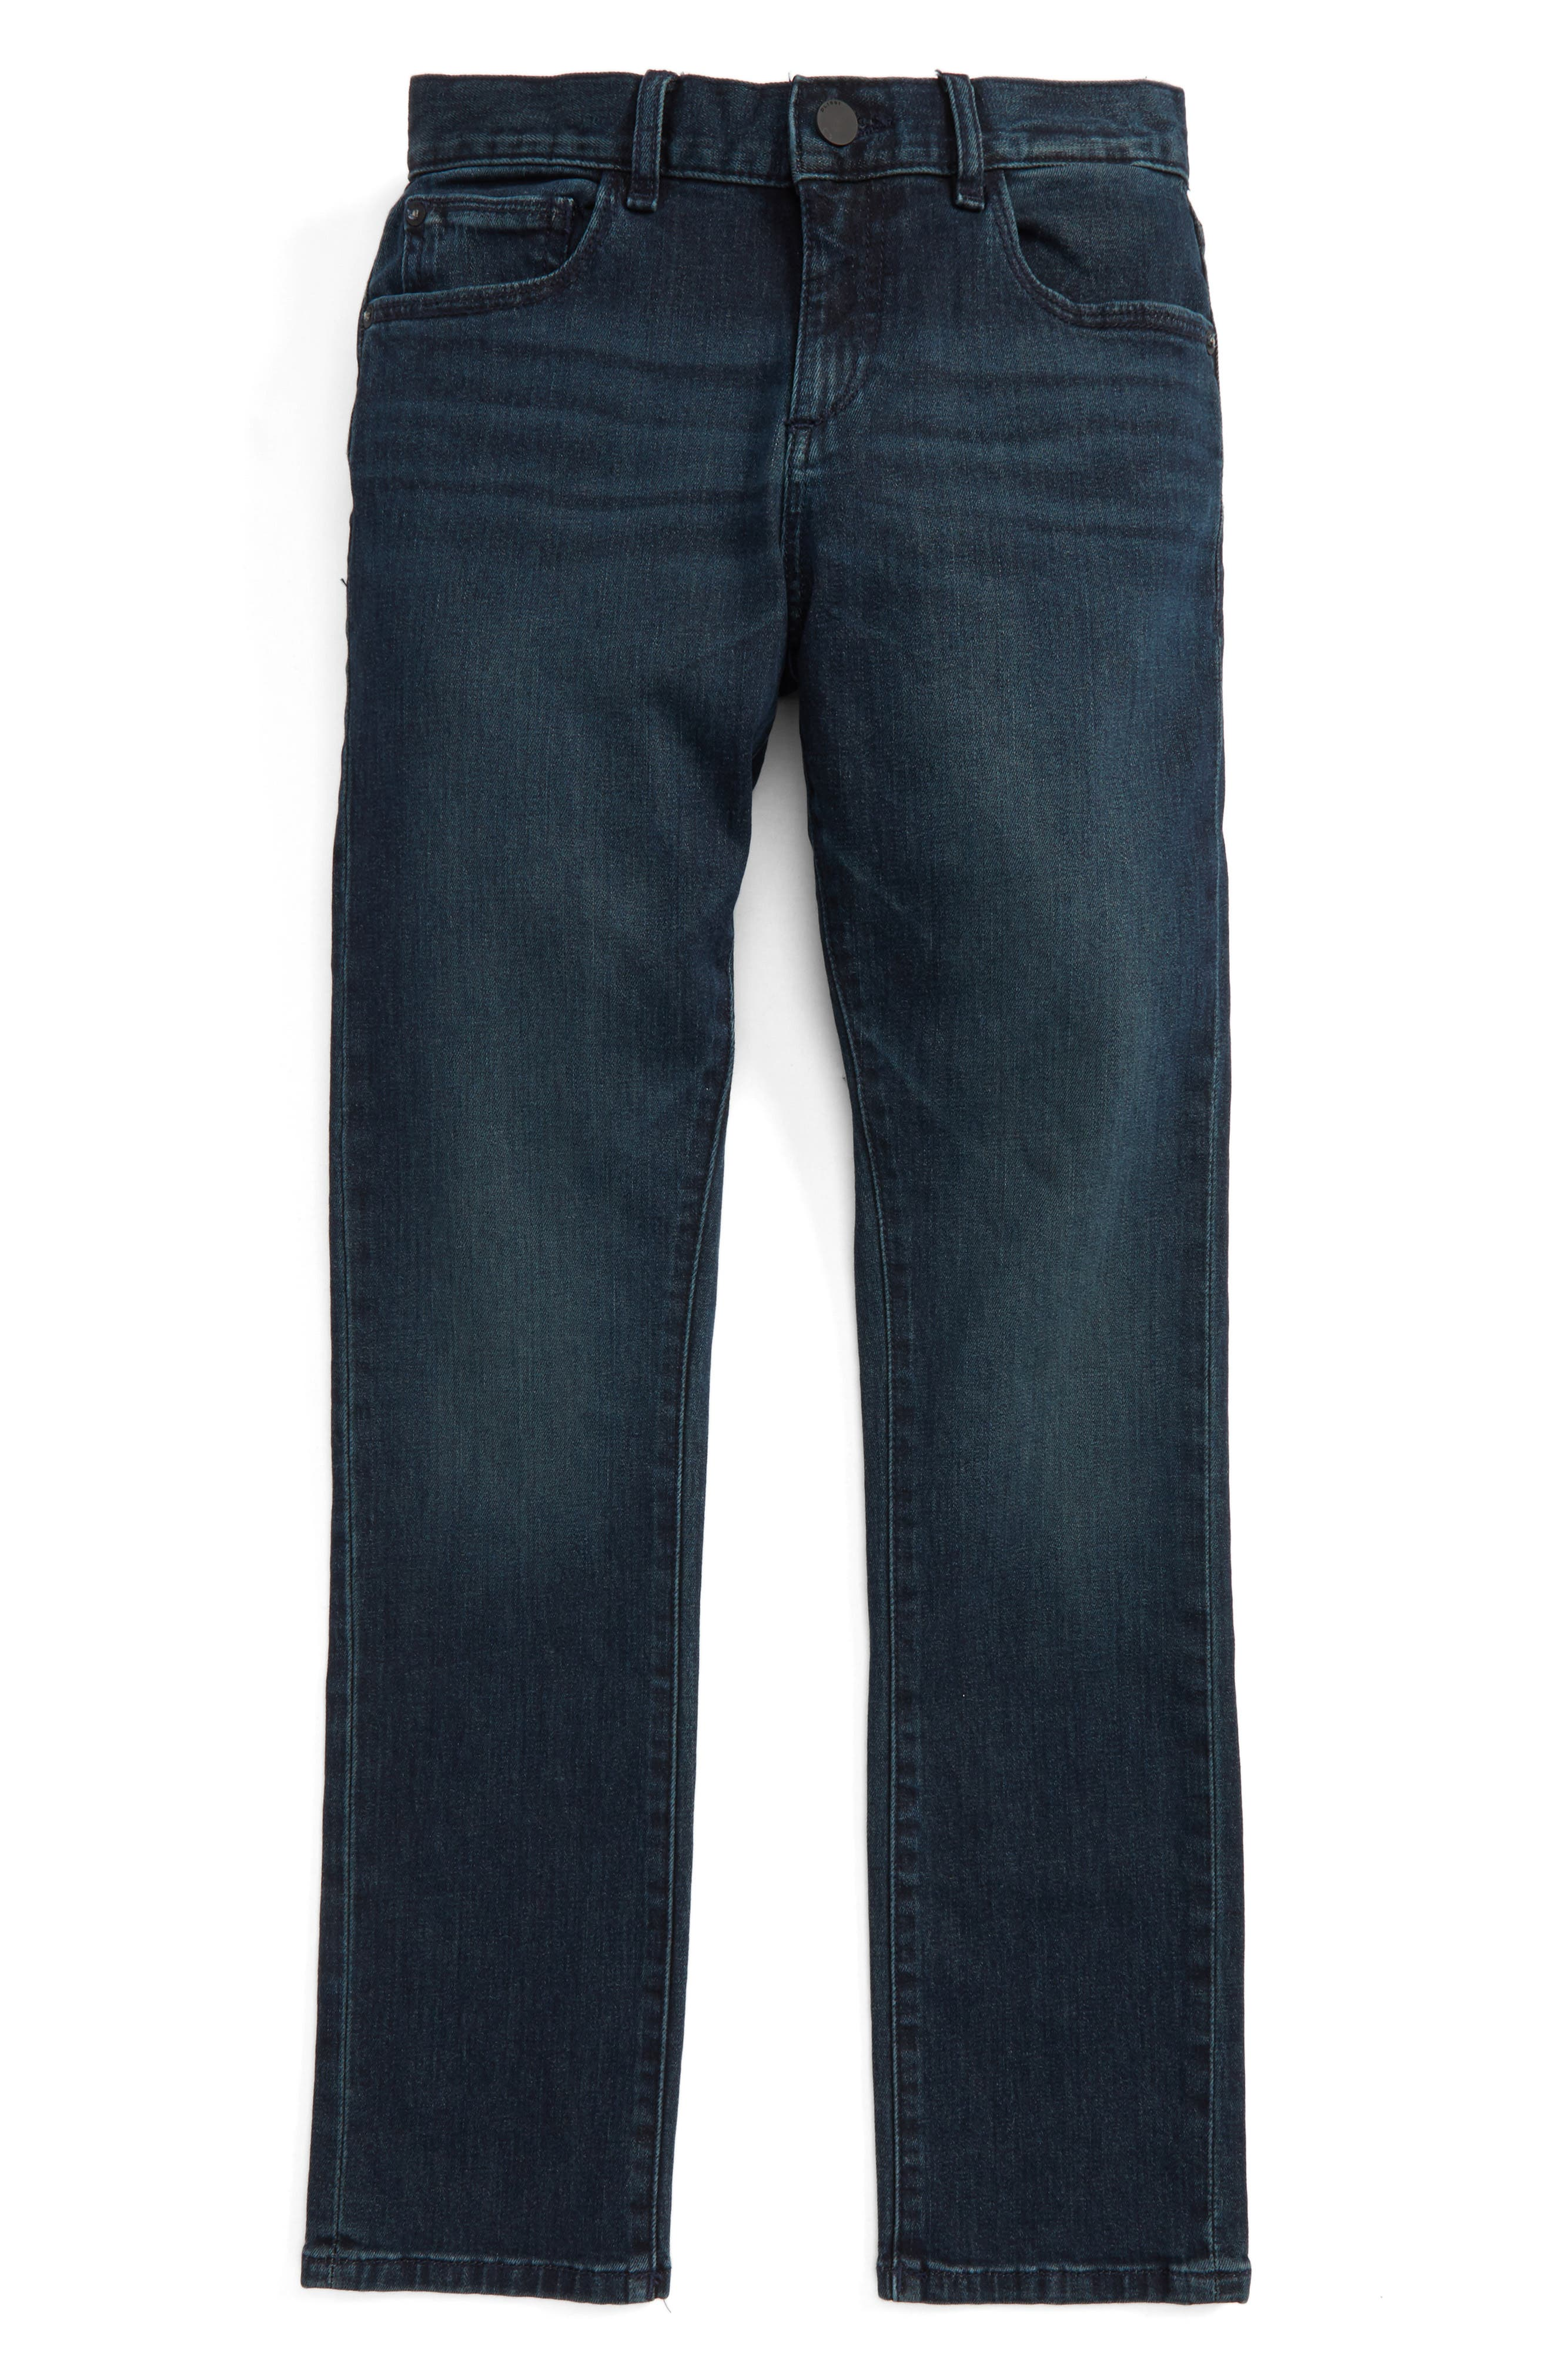 Alternate Image 1 Selected - DL1961 Brady Slim Fit Jeans (Big Boys)